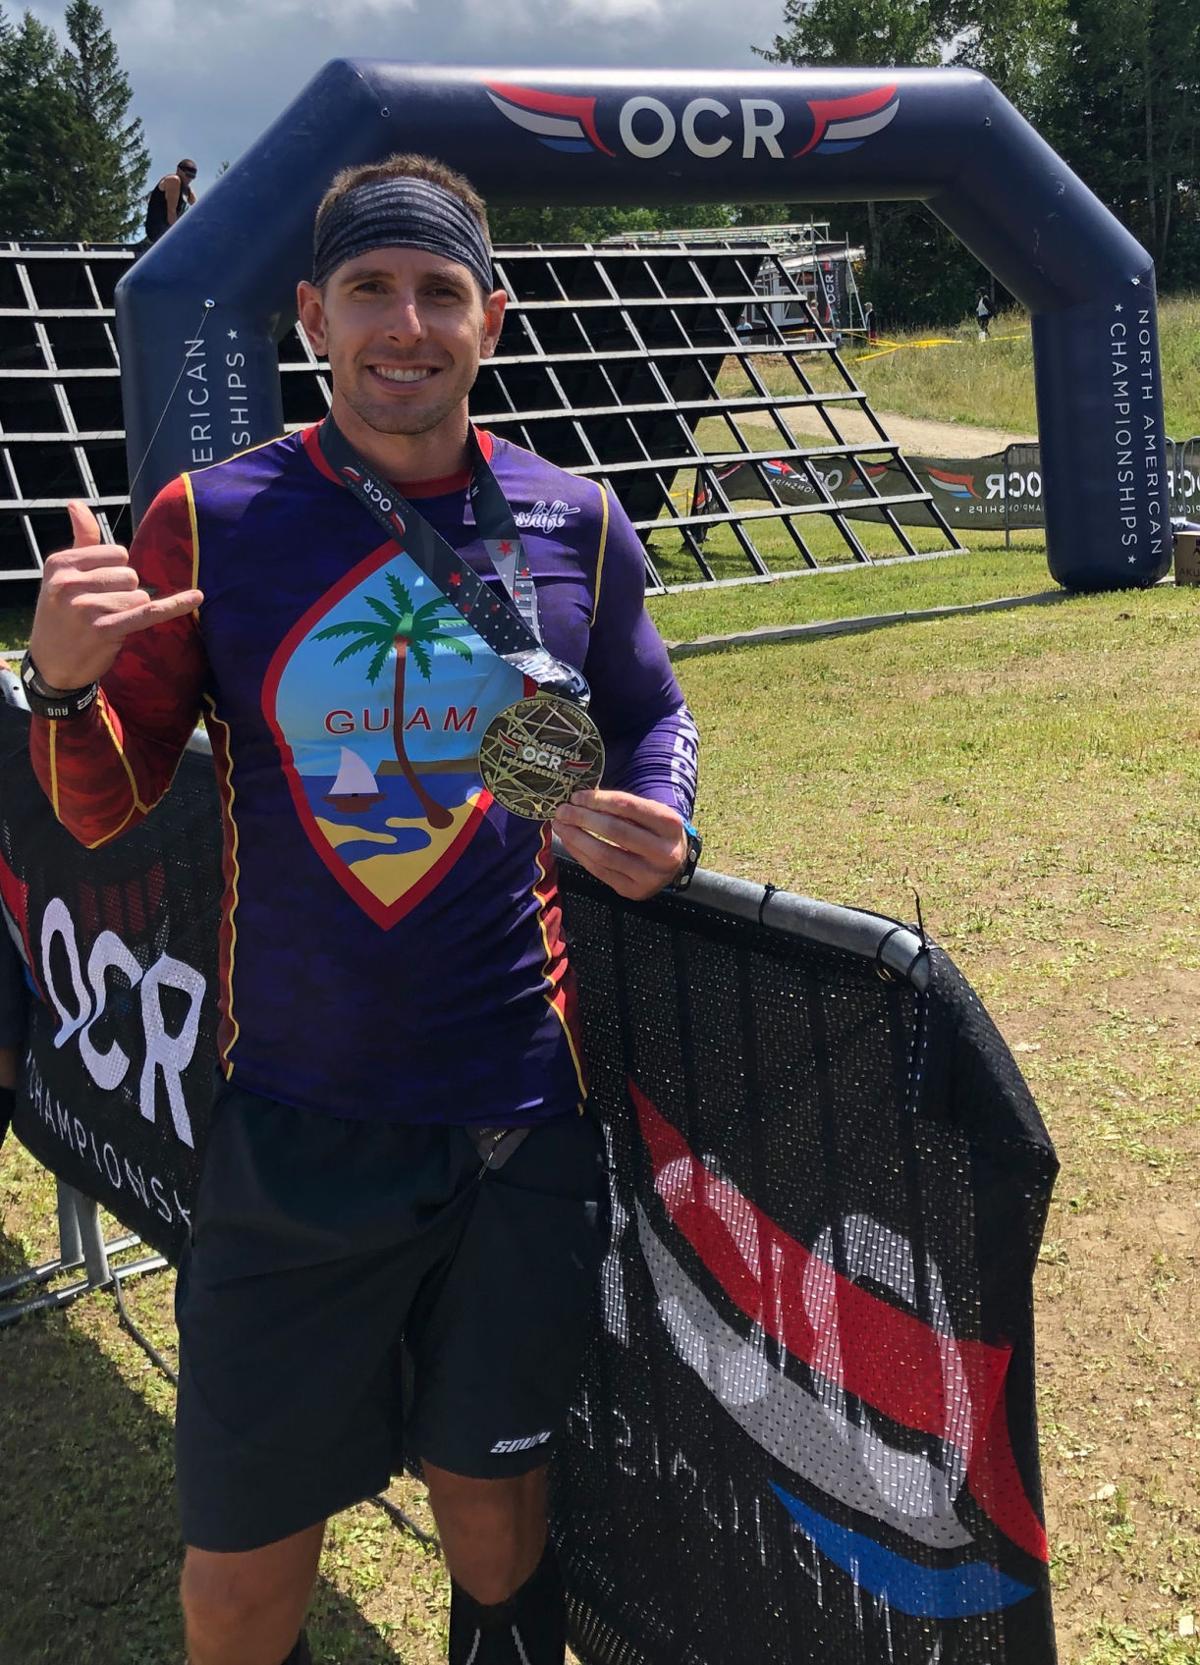 Brian Johnson conquers OCR championship